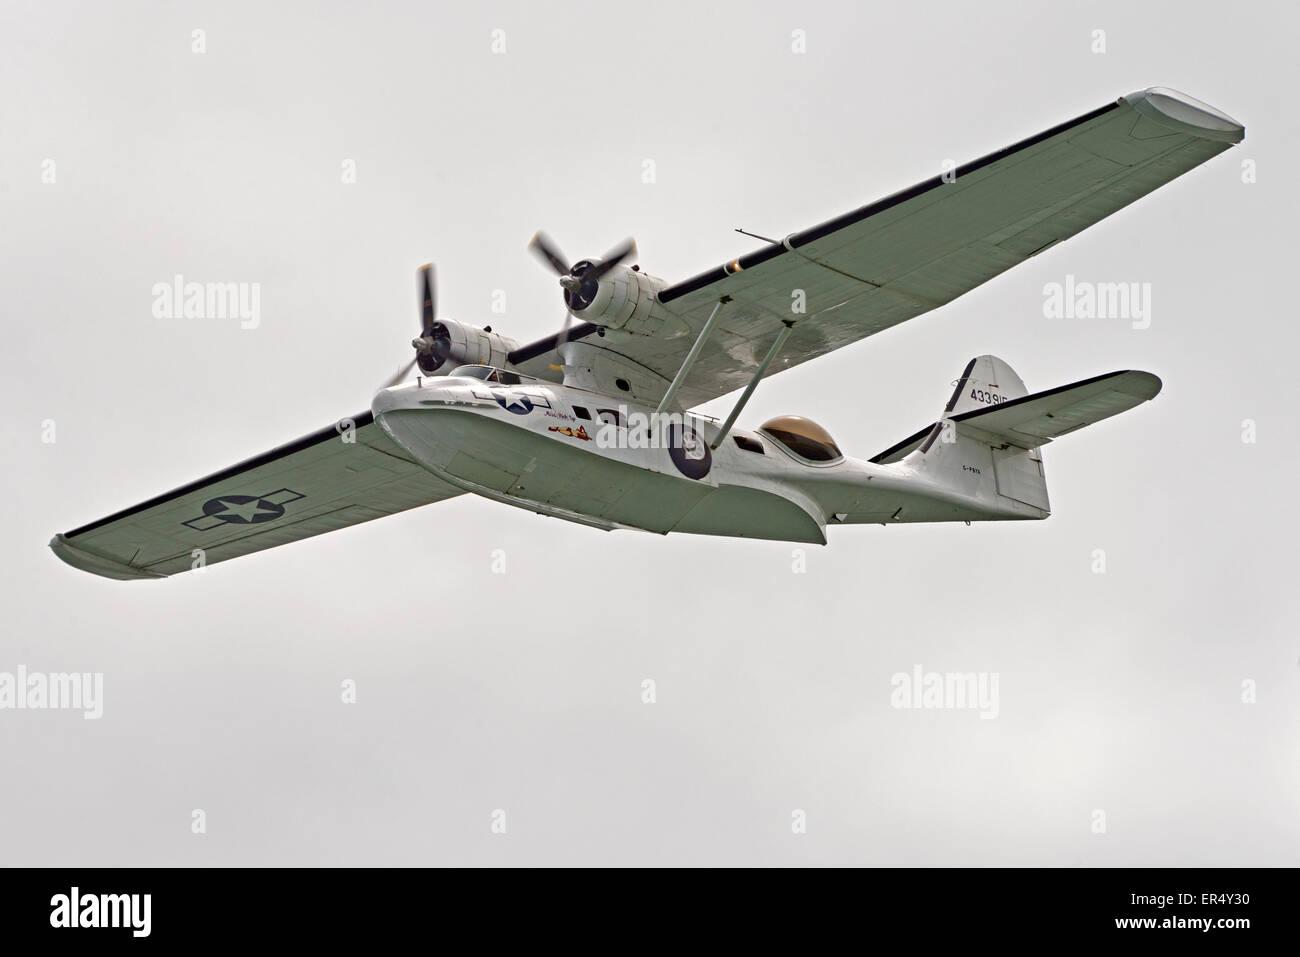 Pby Catalina C Fnjf Flying Boat Llandudno Air Show N Wales Uk